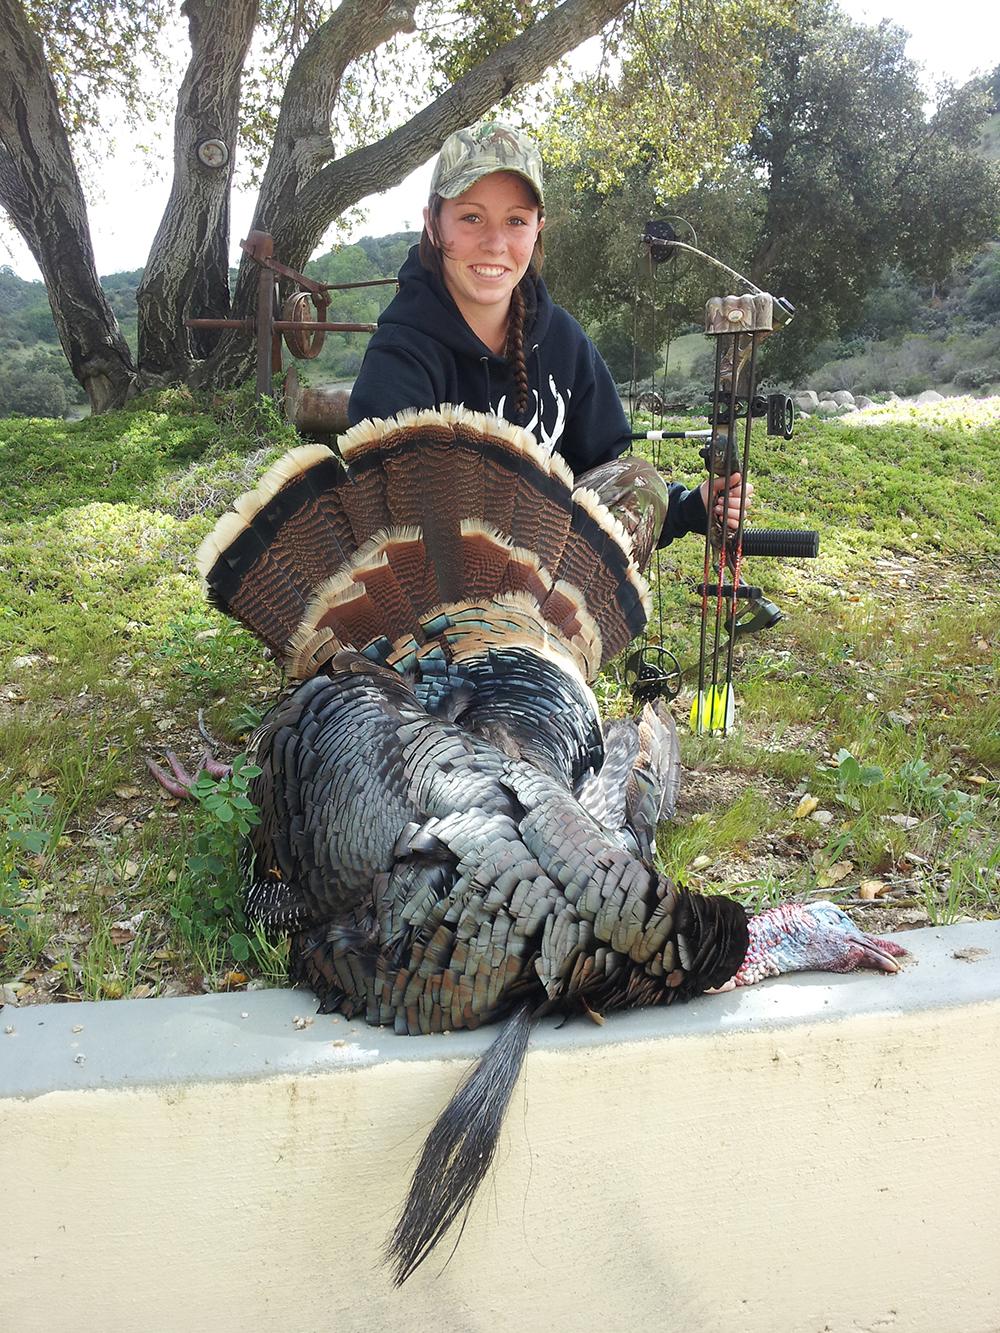 Gobbler, Turkey, Turkey Hunting, Hunting Turkey, New Mexico Turkey Hunting